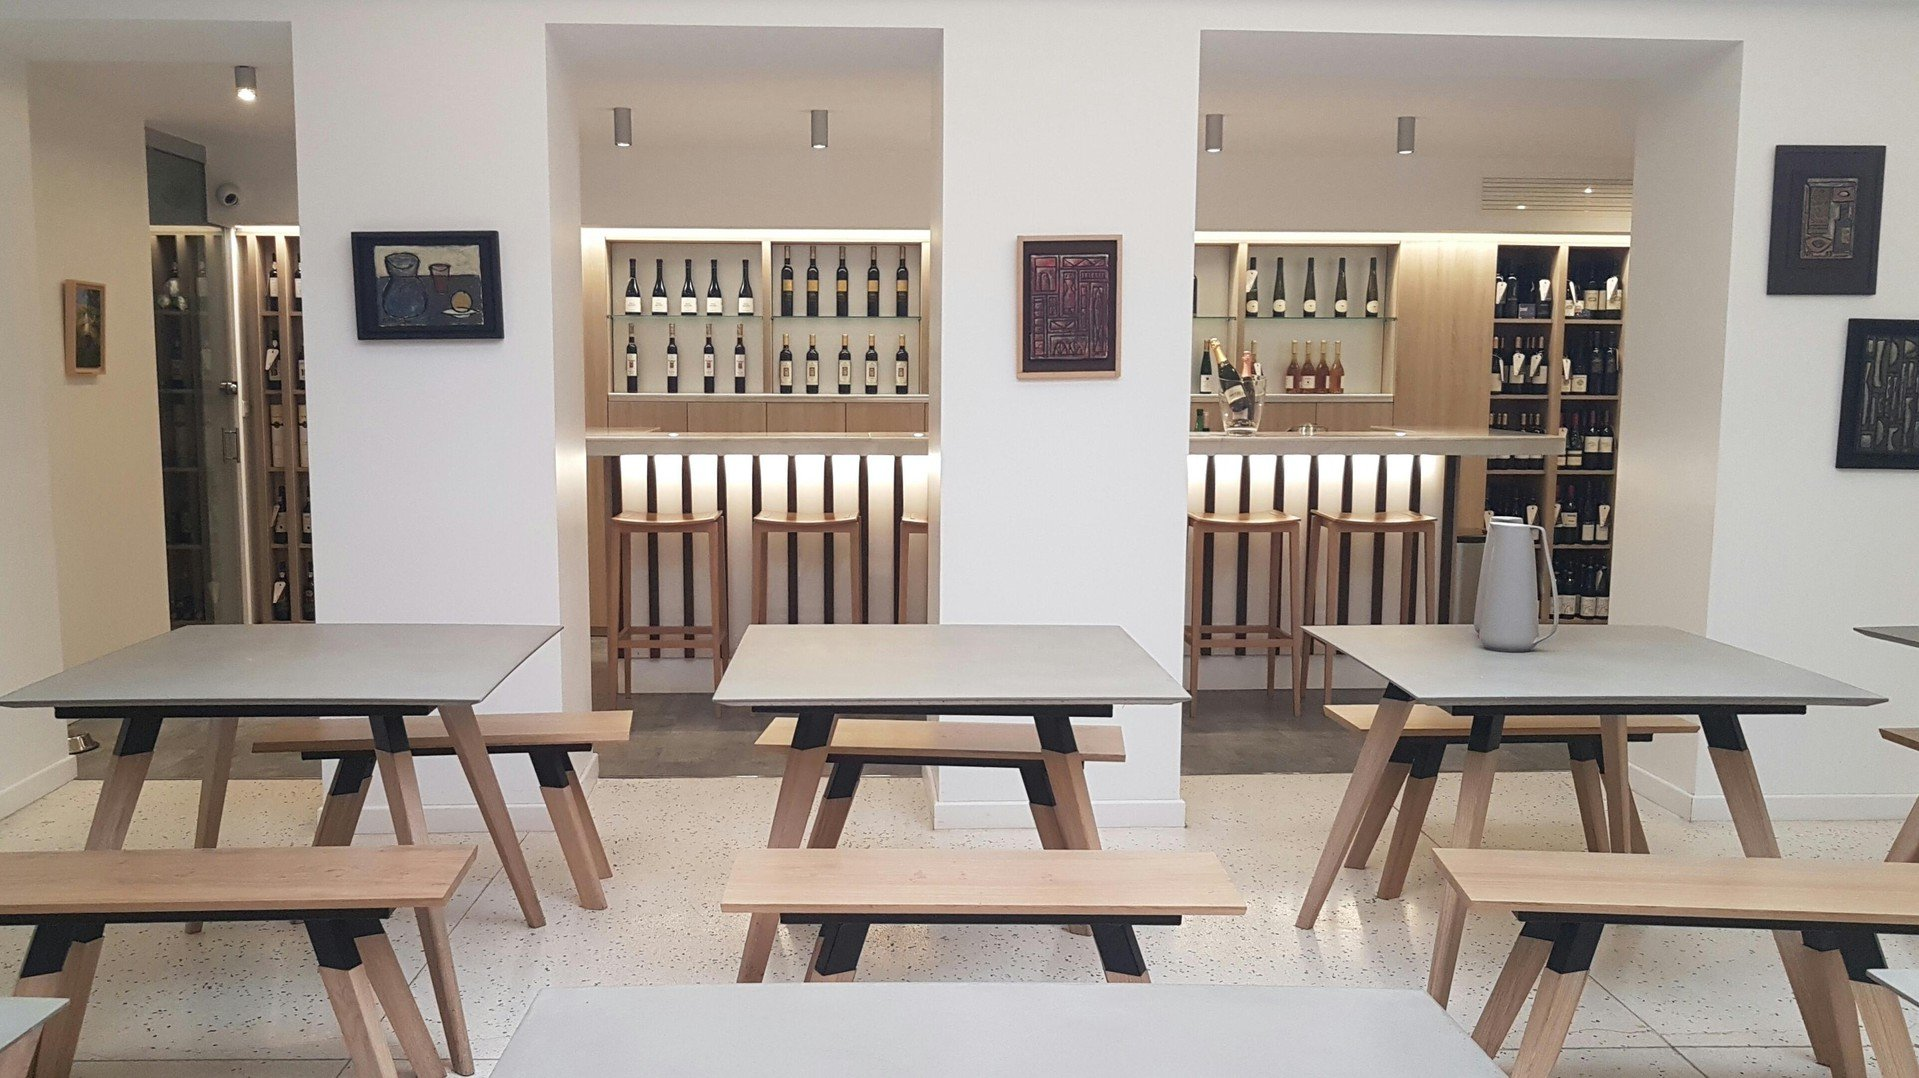 Paris corporate event venues Besonders Fabulous private meeting room in a wine cellar image 9